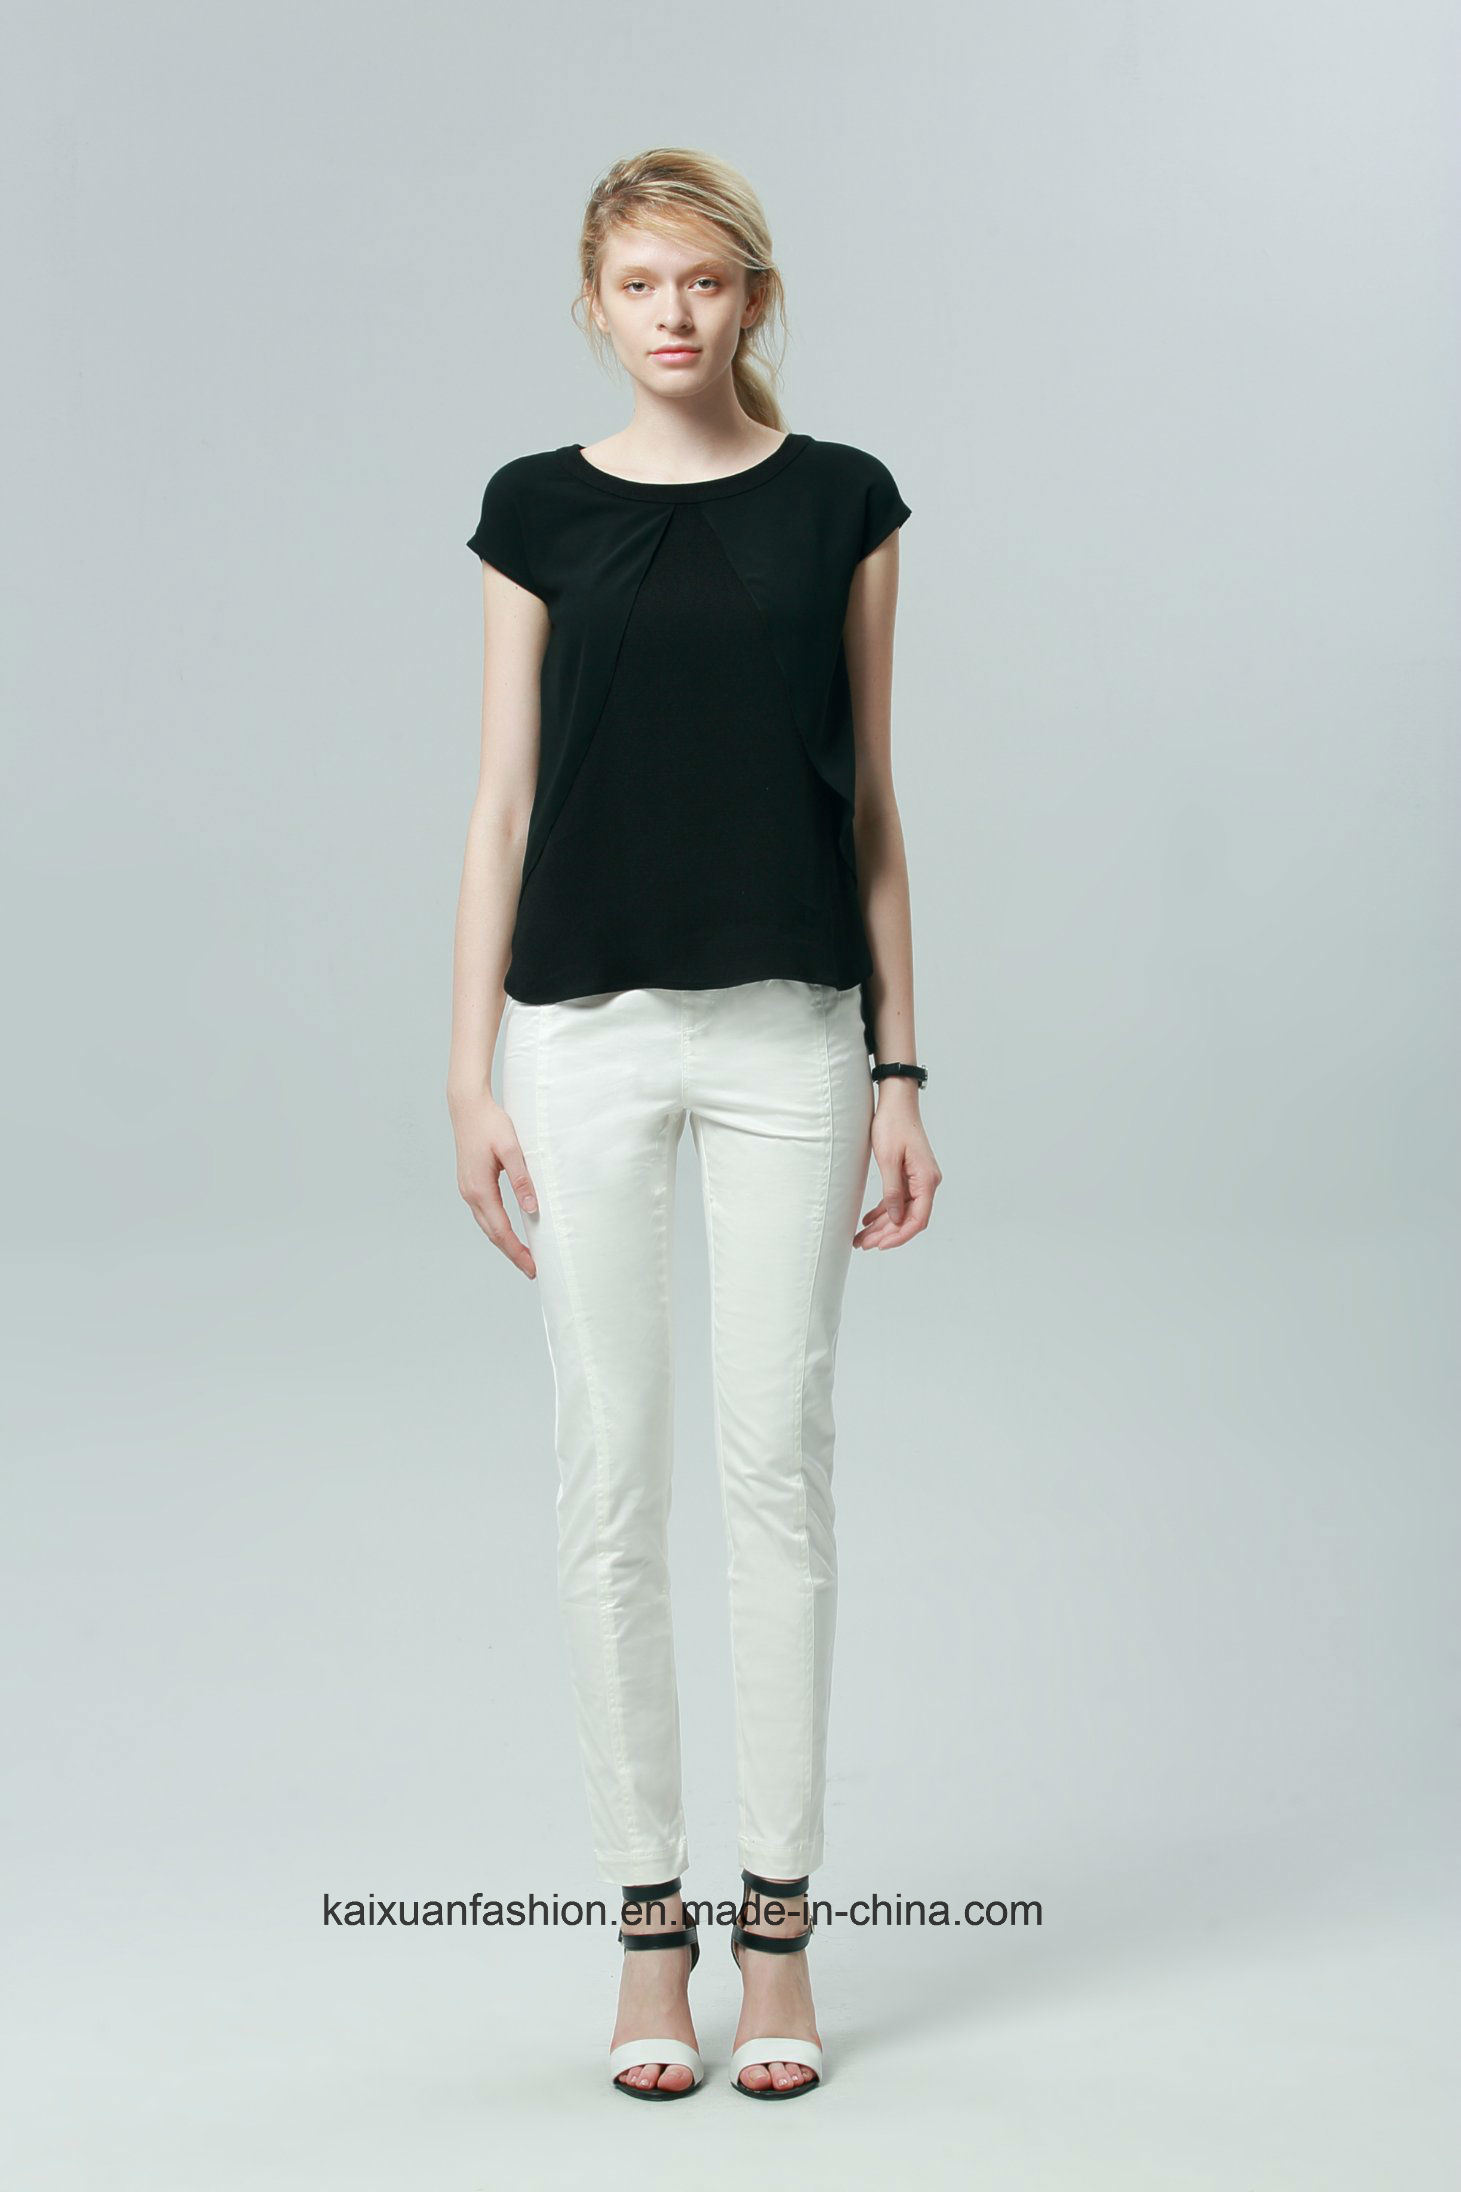 cea5226edb504 Wholesale Ladies Shirts Blouses - BCD Tofu House